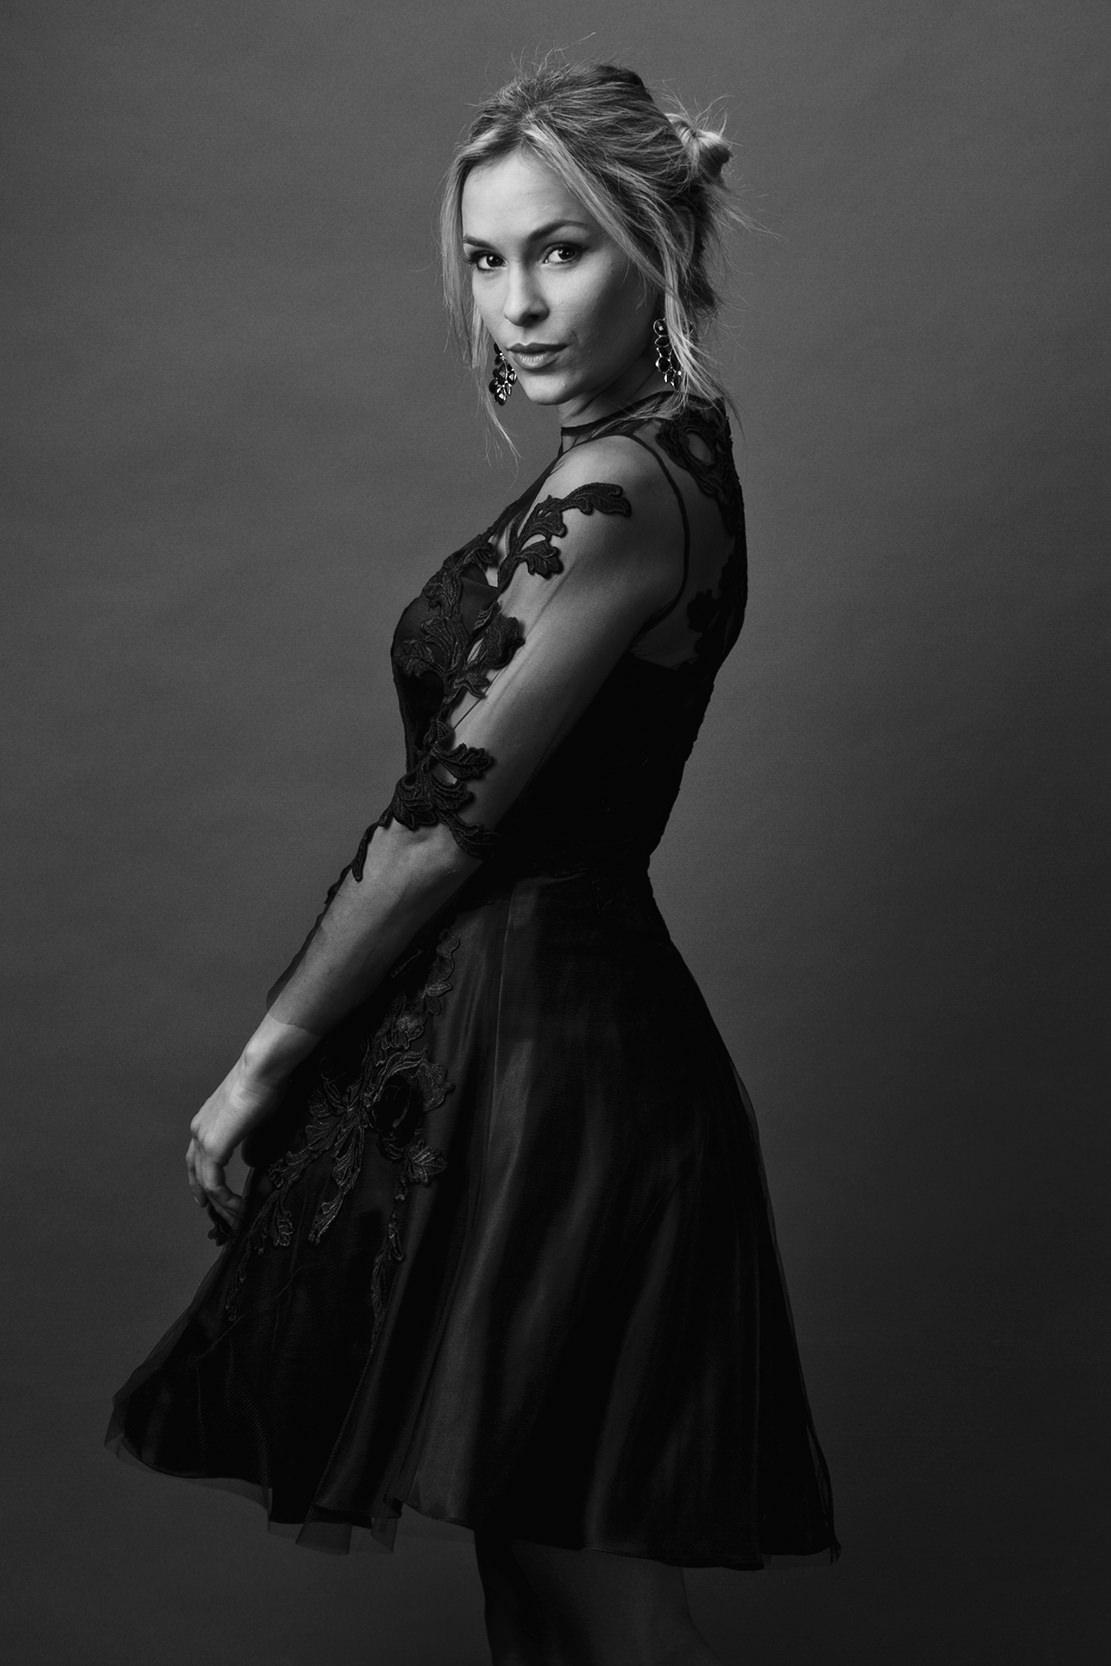 shanie-mioto-in-black-dress.jpg